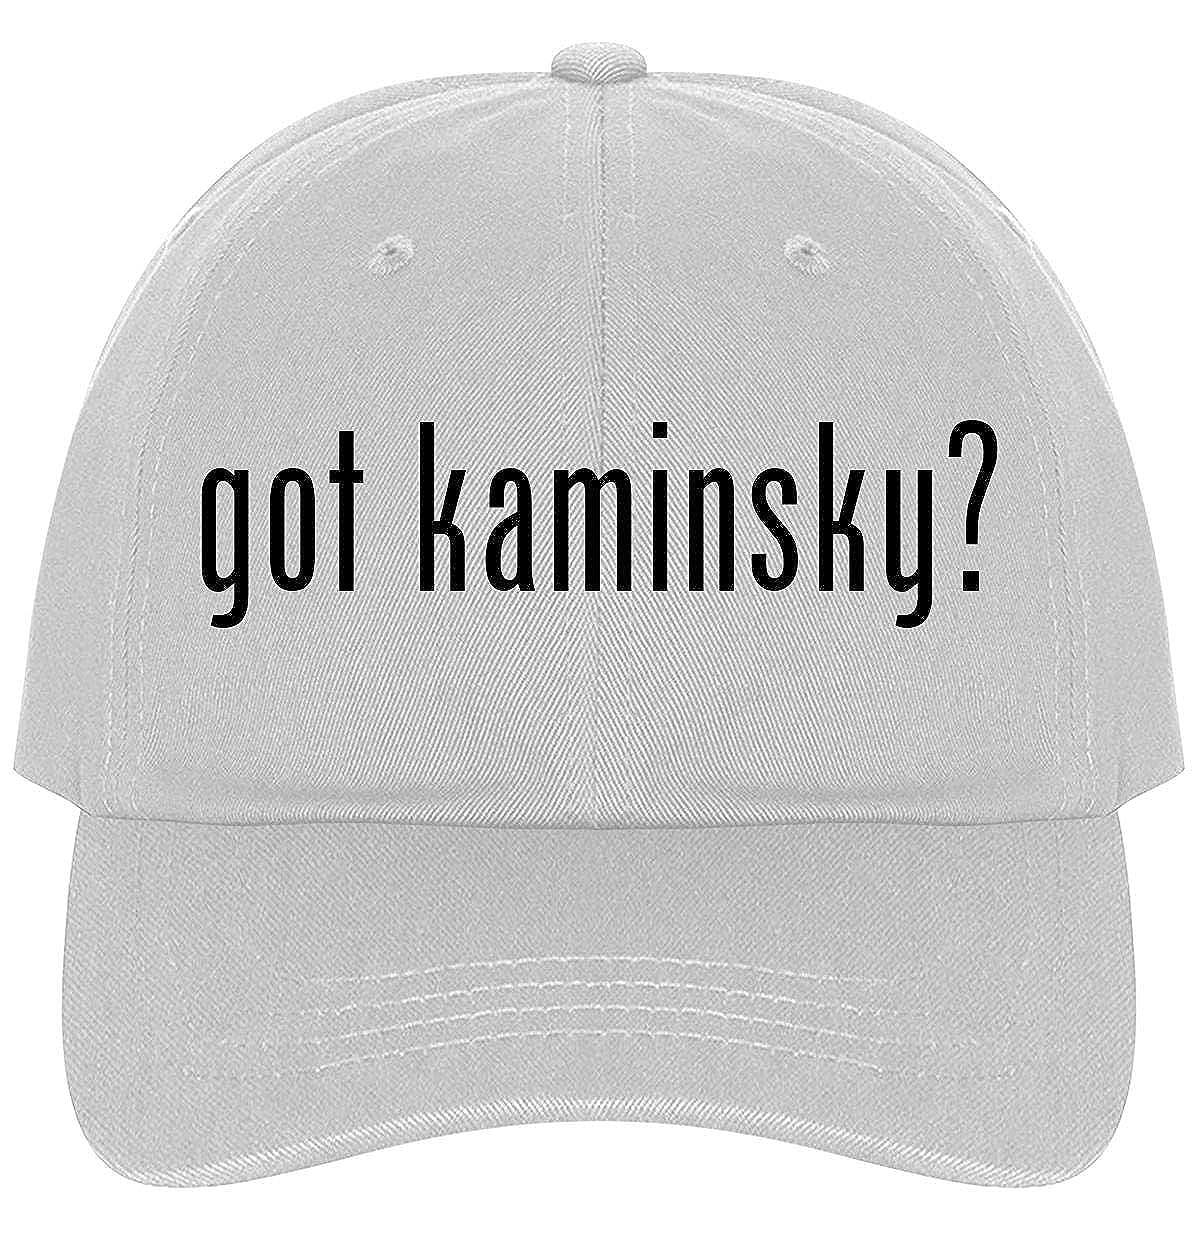 The Town Butler got Kaminsky? - A Nice Comfortable Adjustable Dad Hat Cap